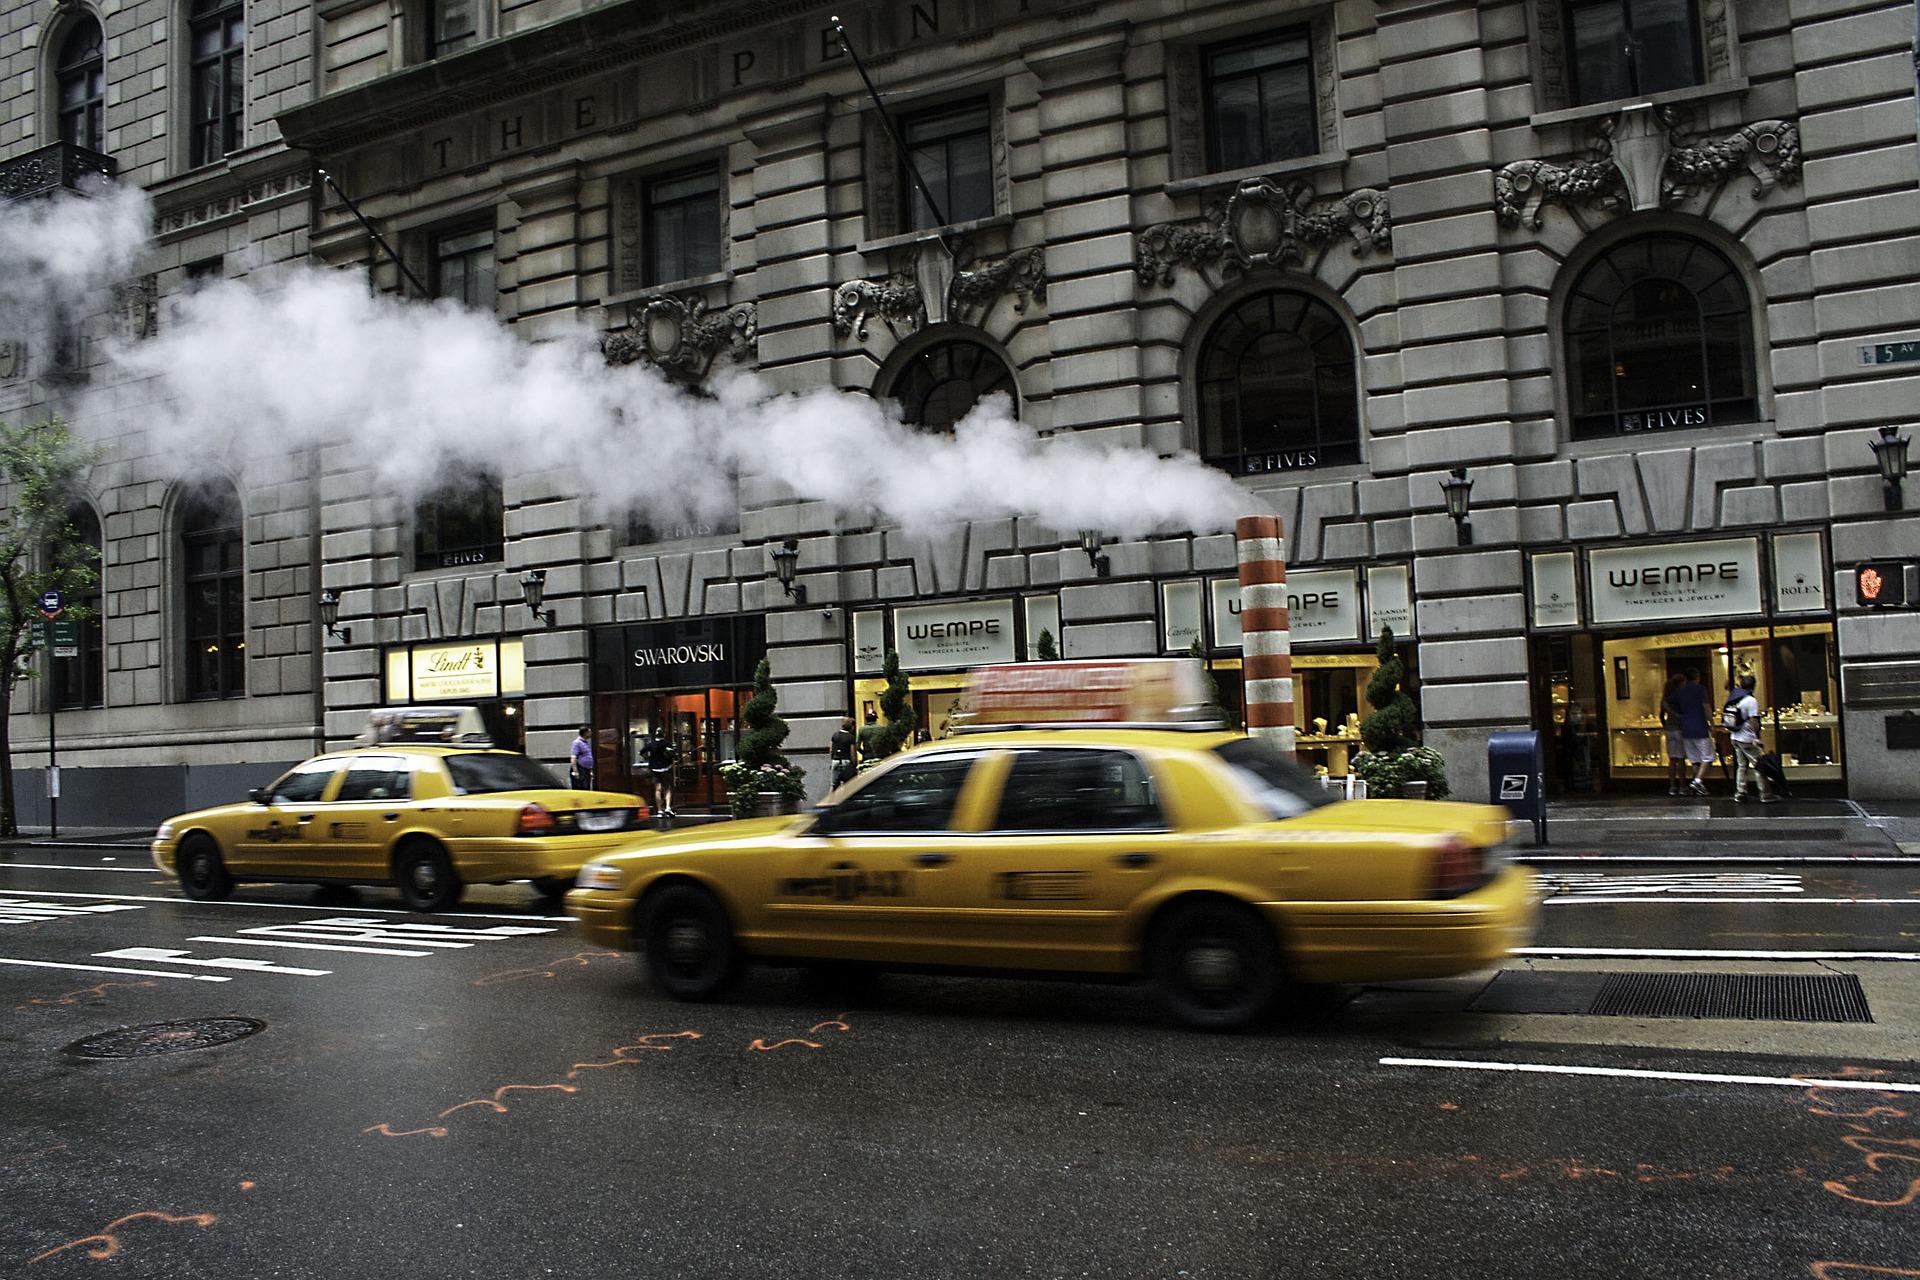 new-york-648640_1920.jpg?1550336730